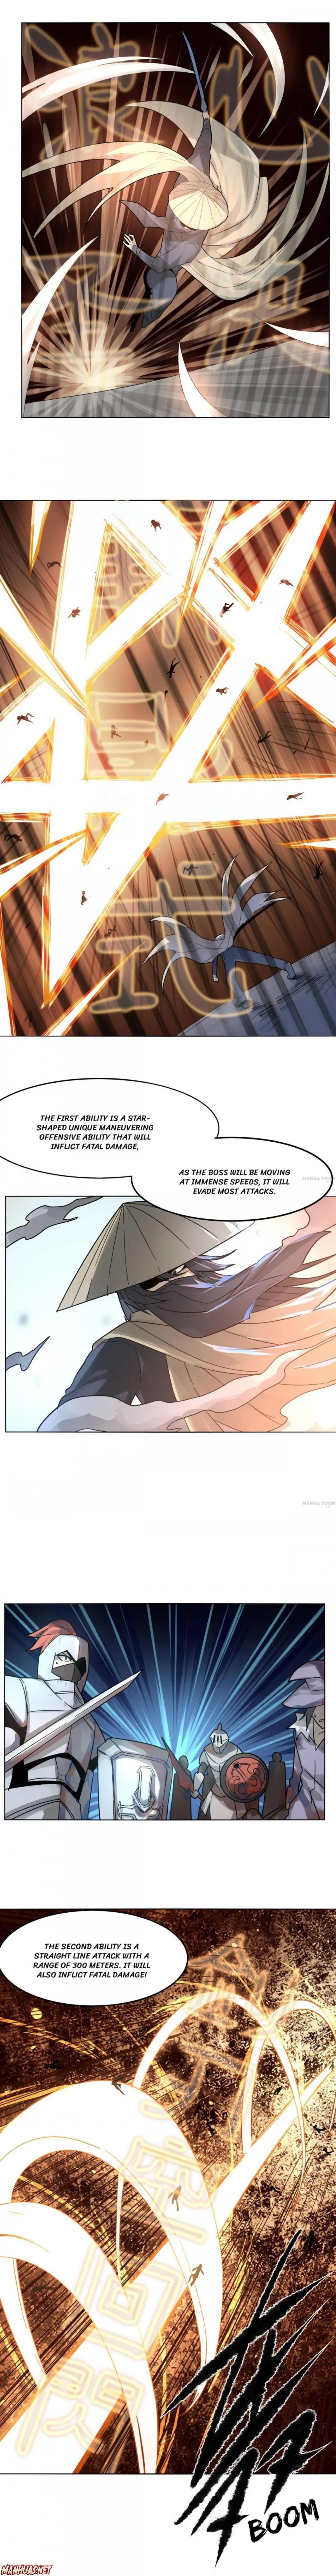 Manga Sword Of Benevolence - Chapter 93 Page 1